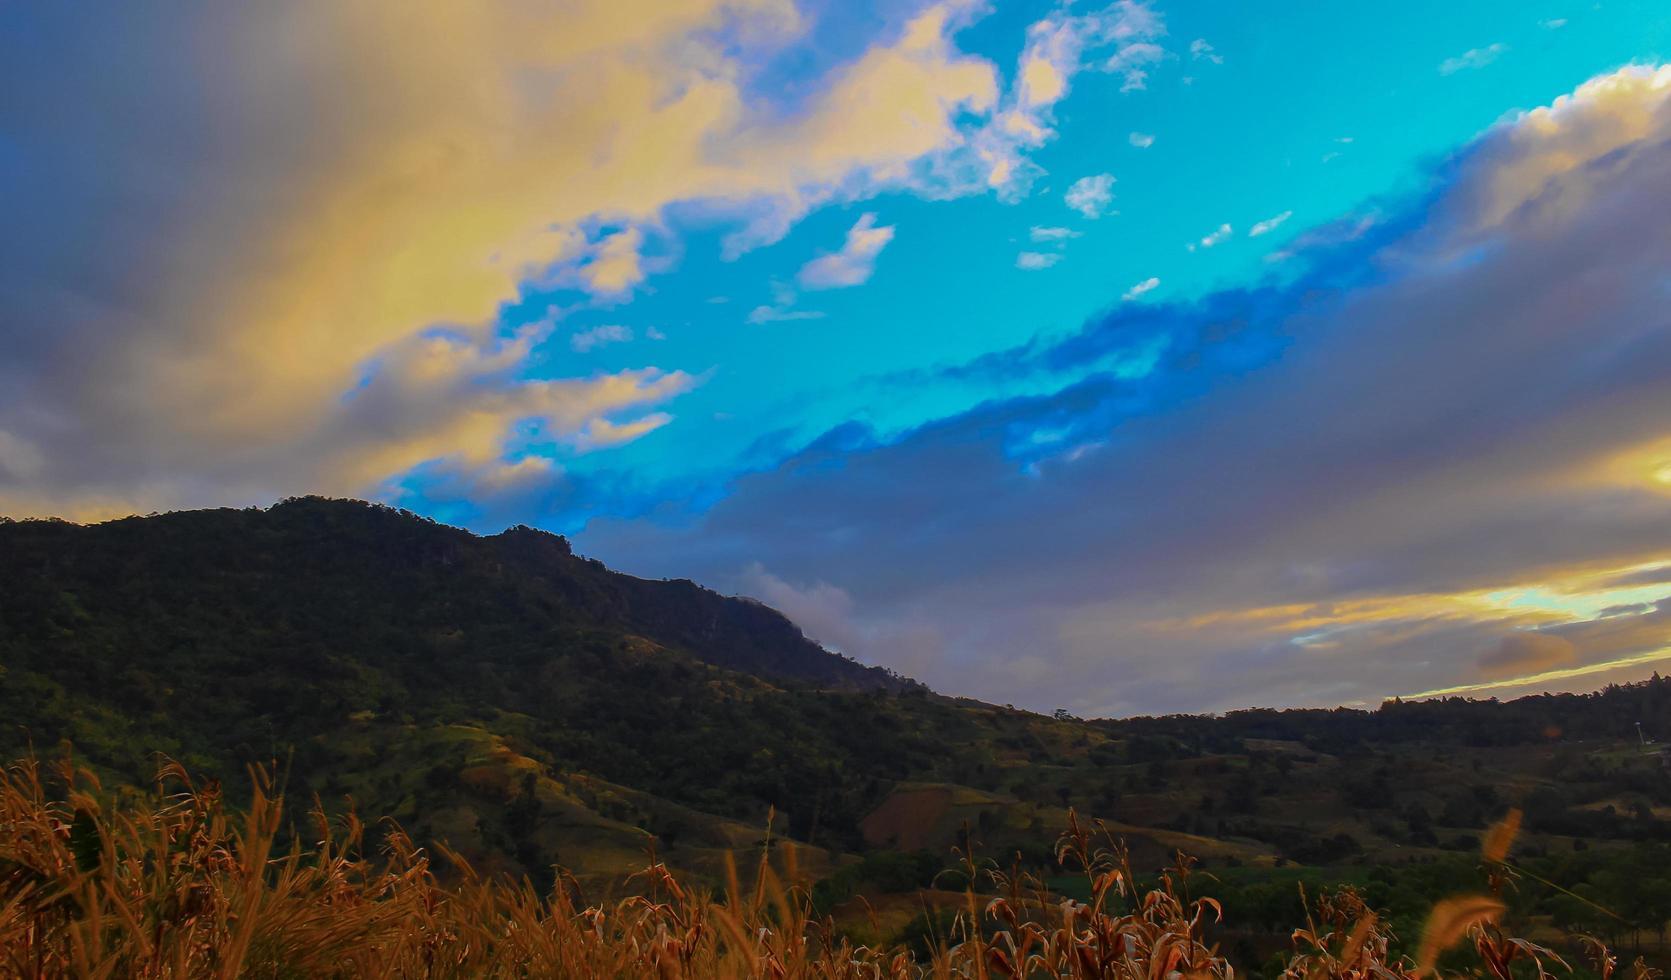 zonsopgang op een platteland foto